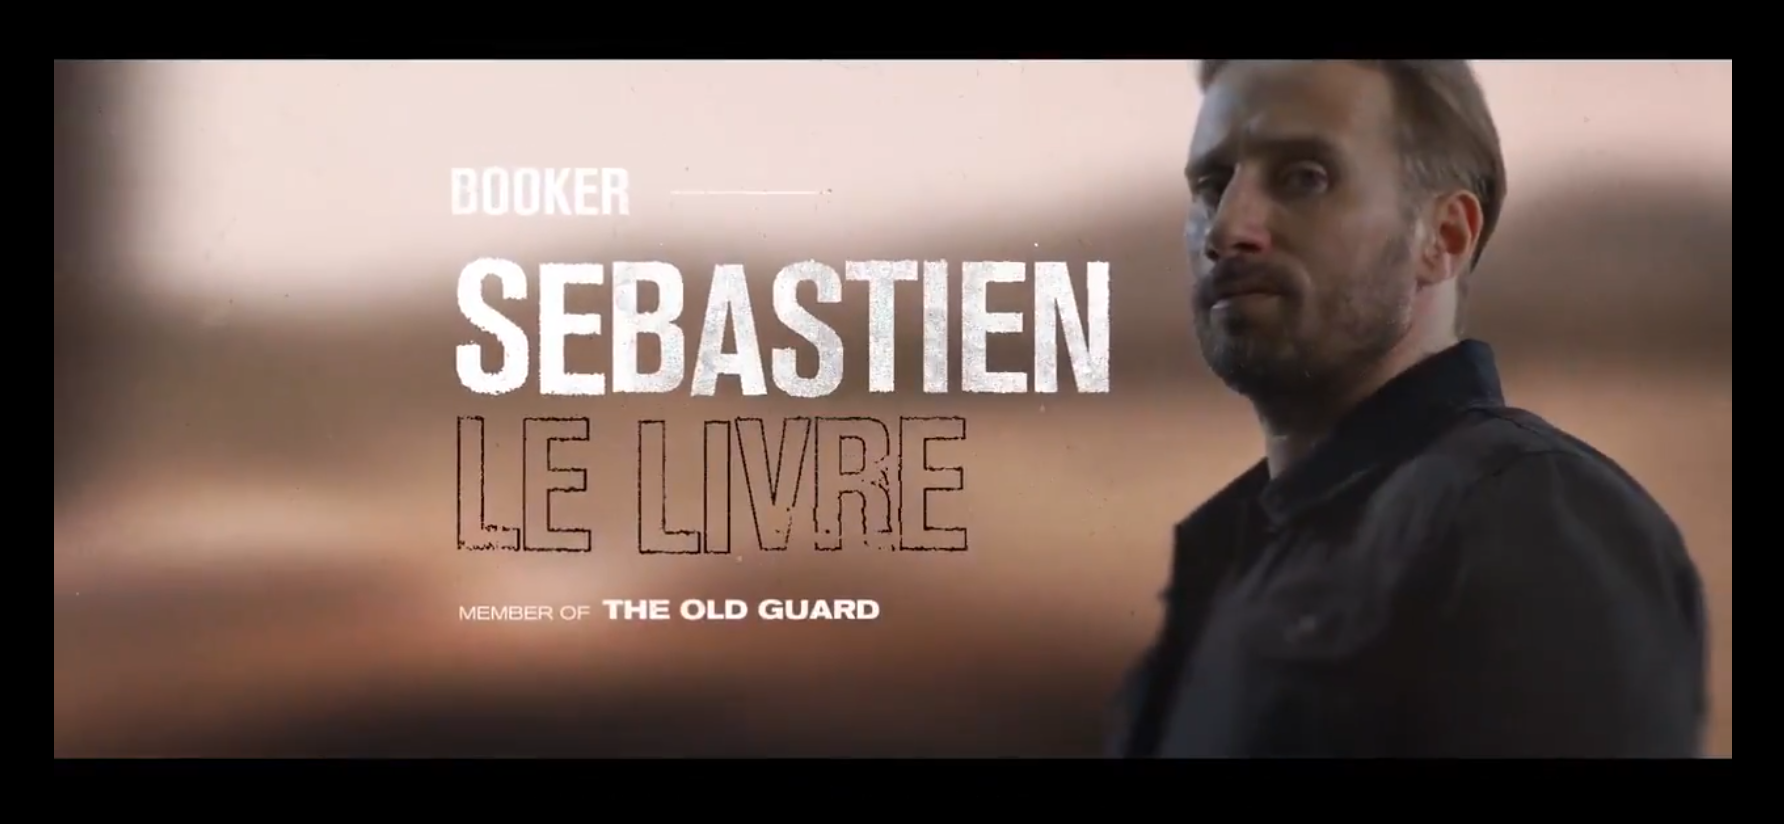 Sebastien Le Livre - Booker